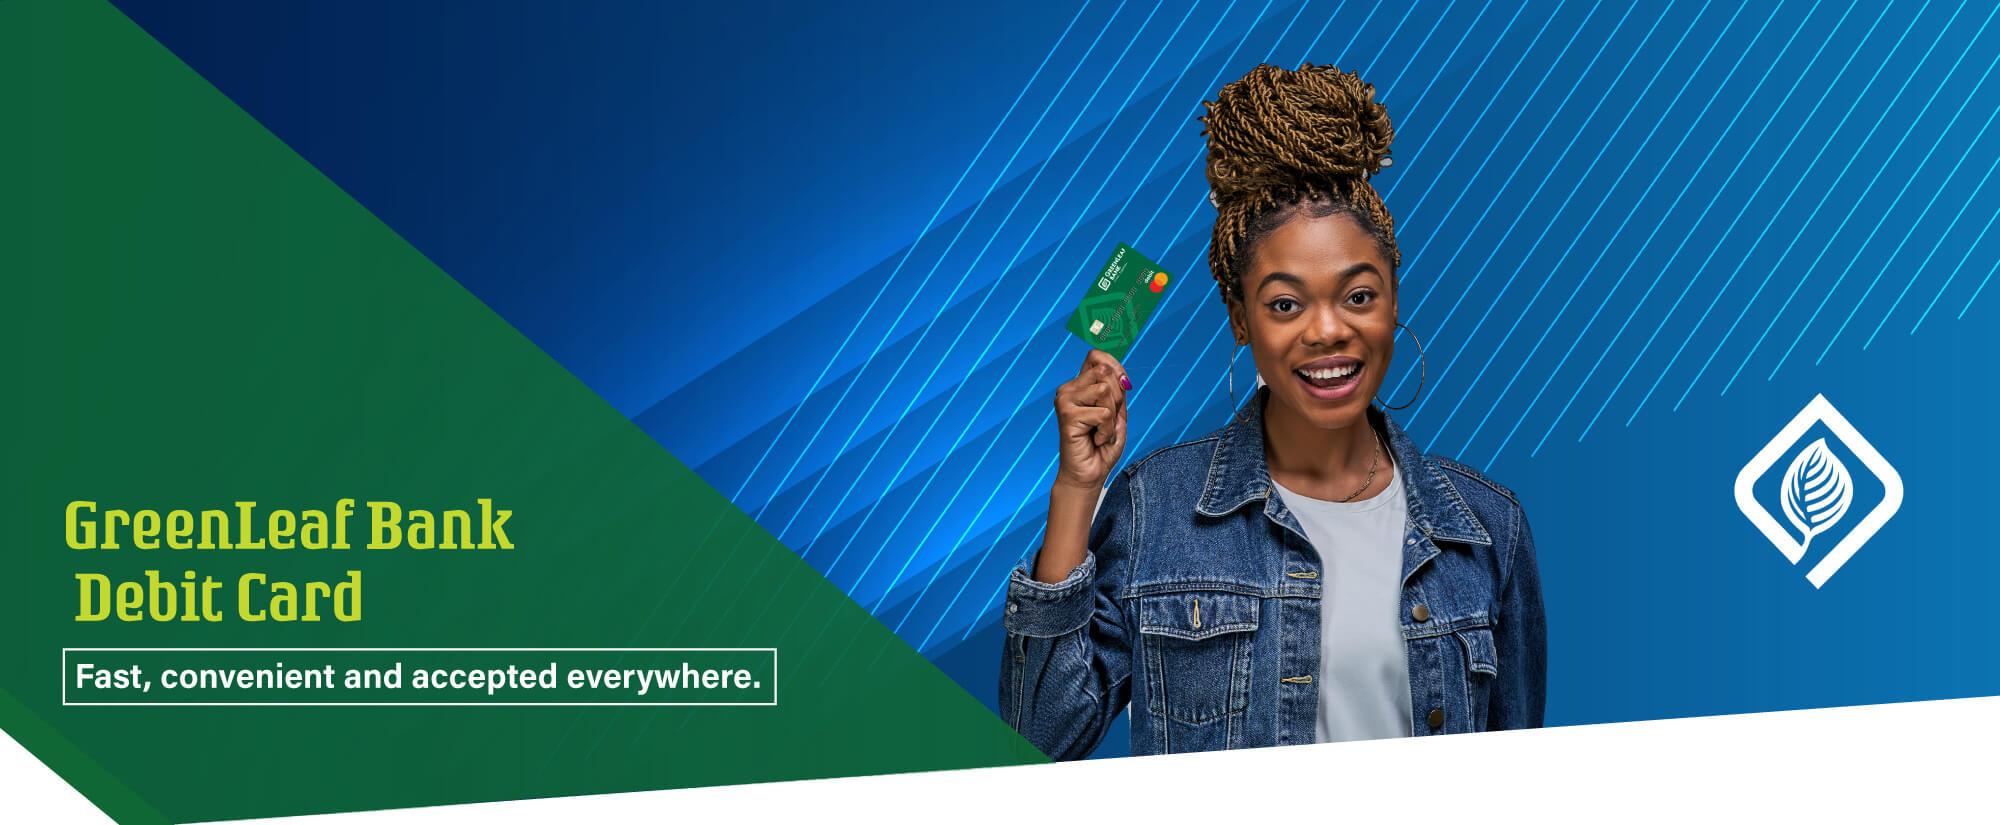 GreenLeaf Bank Debit Card accepted Everywhere